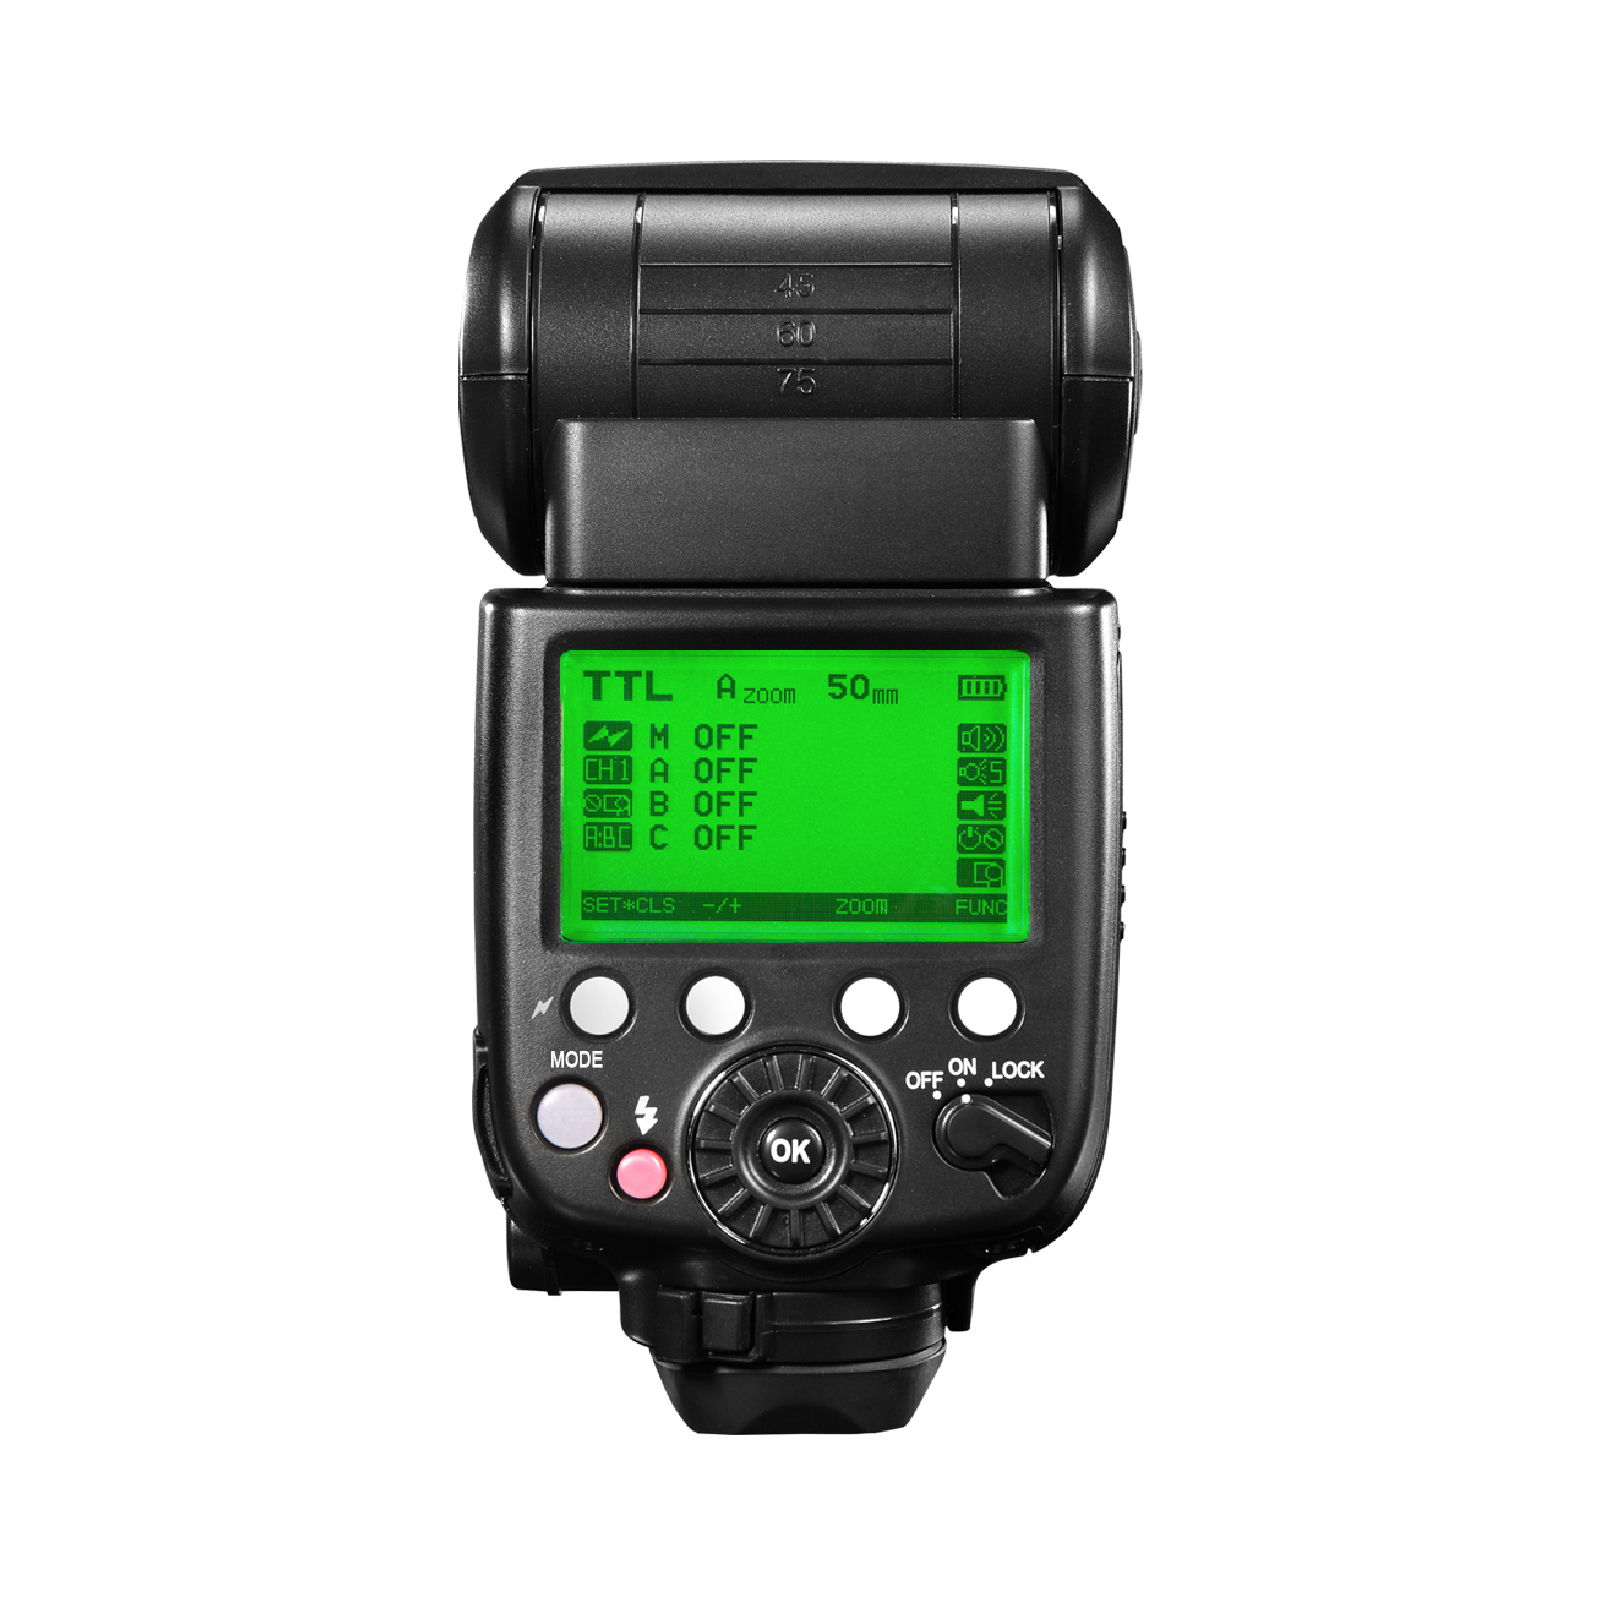 Pixel X800N Pro Speedlite, high speed synchronization and powerful performance.